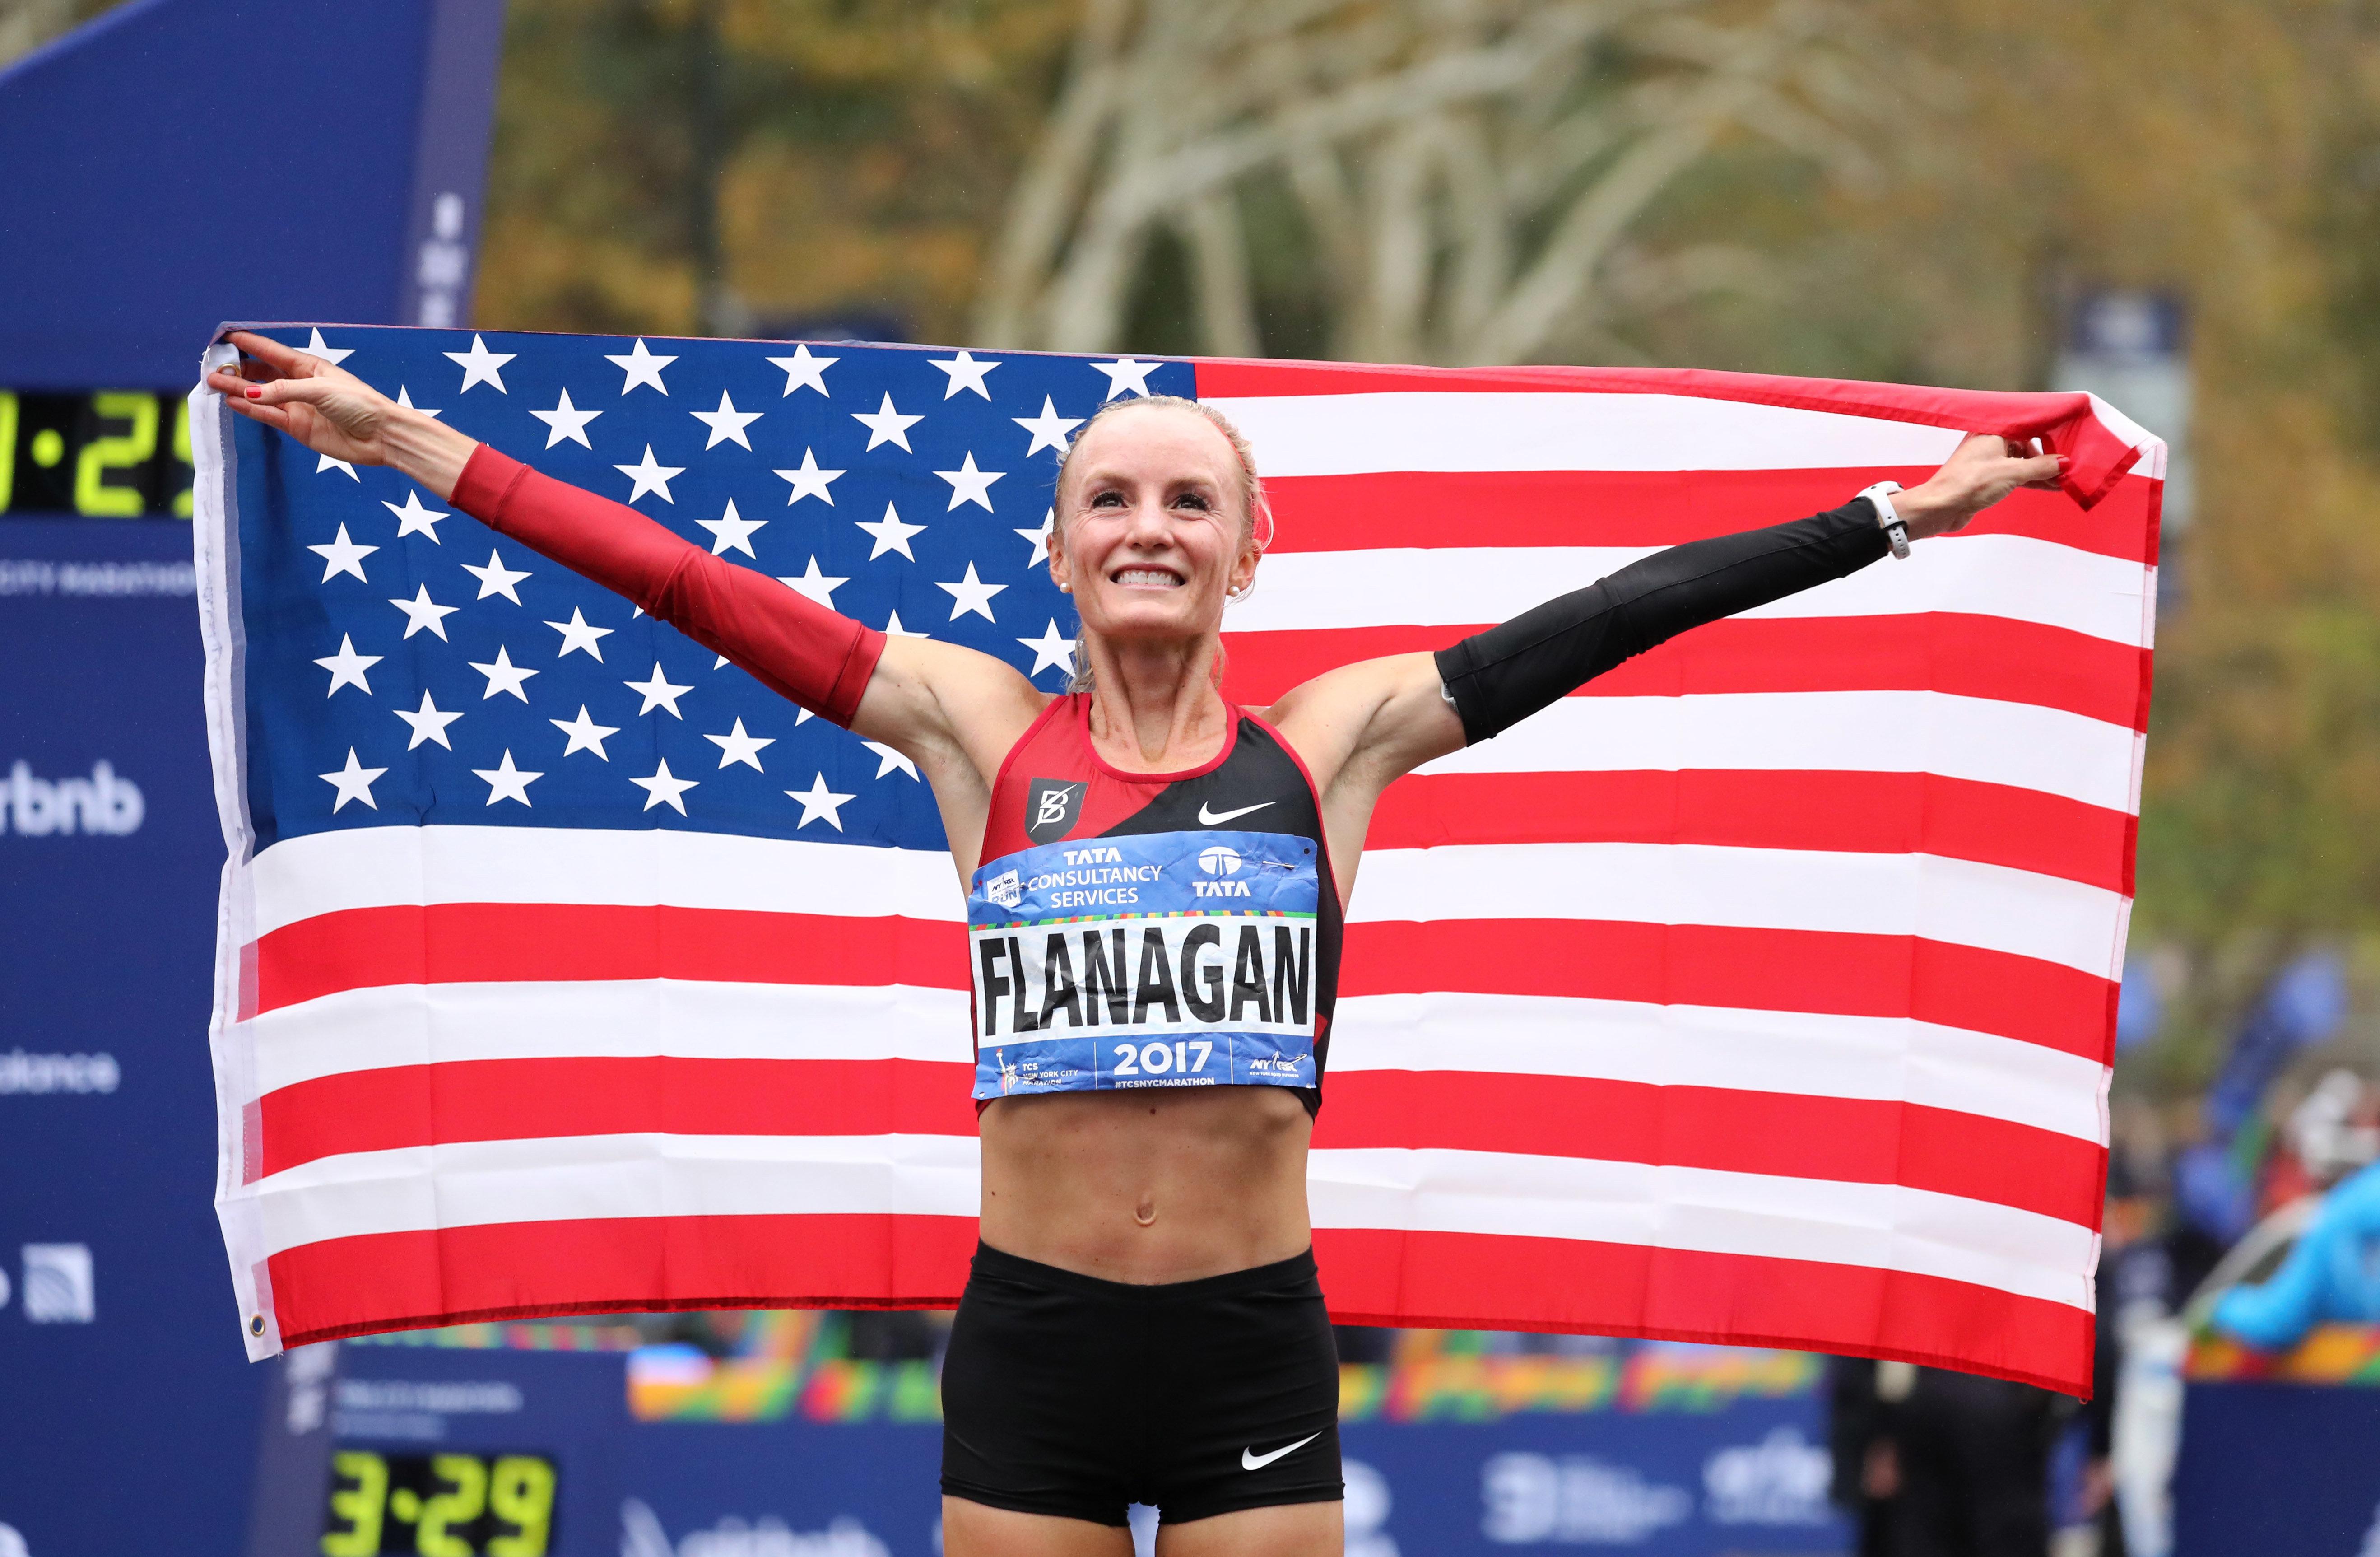 Shalene Flanagan wins NYC Marathon - 2017